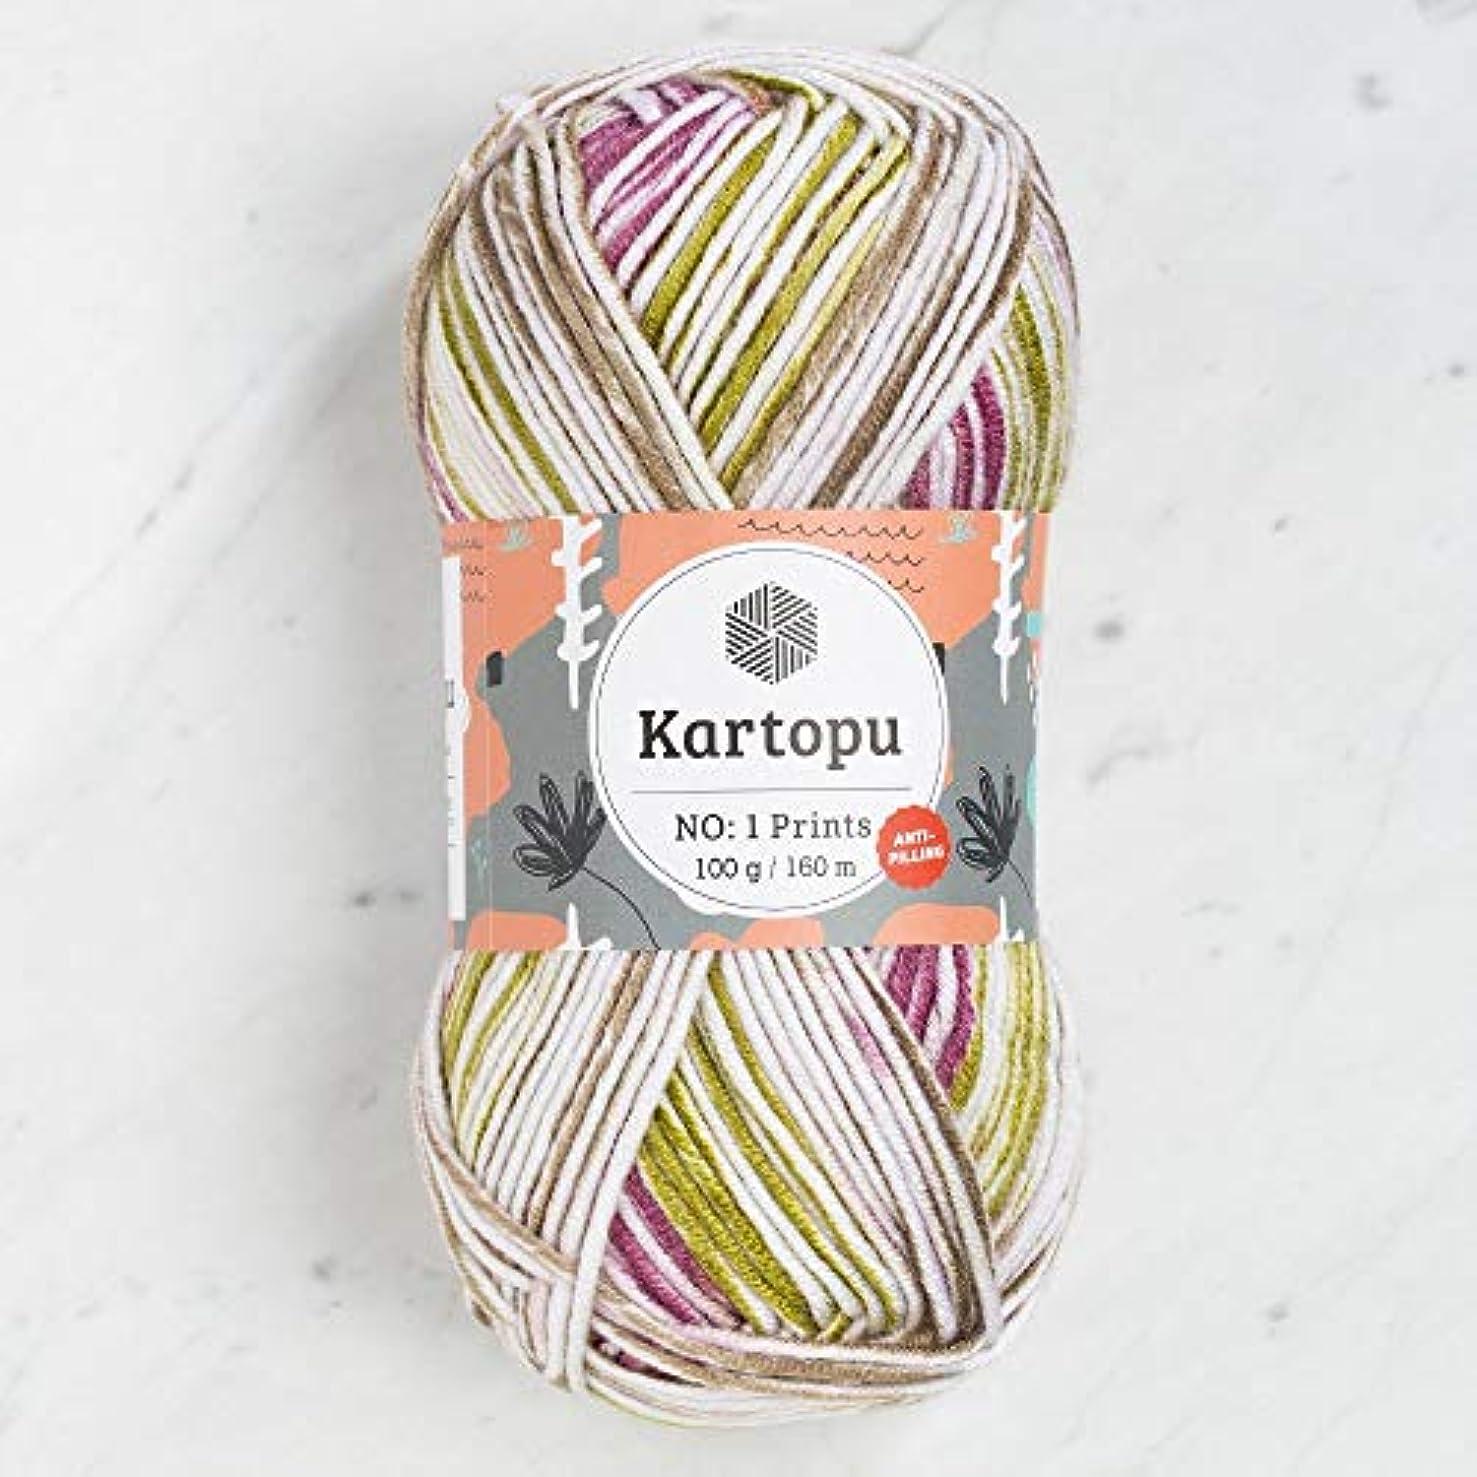 3 Skein Kartopu No1 Prints, Total 10.5 Oz Each 3.5 oz (100 g) / 174yd (160m), Acrylic Bulky, Chunky, Colorful Yarn, Multicolored - H1812